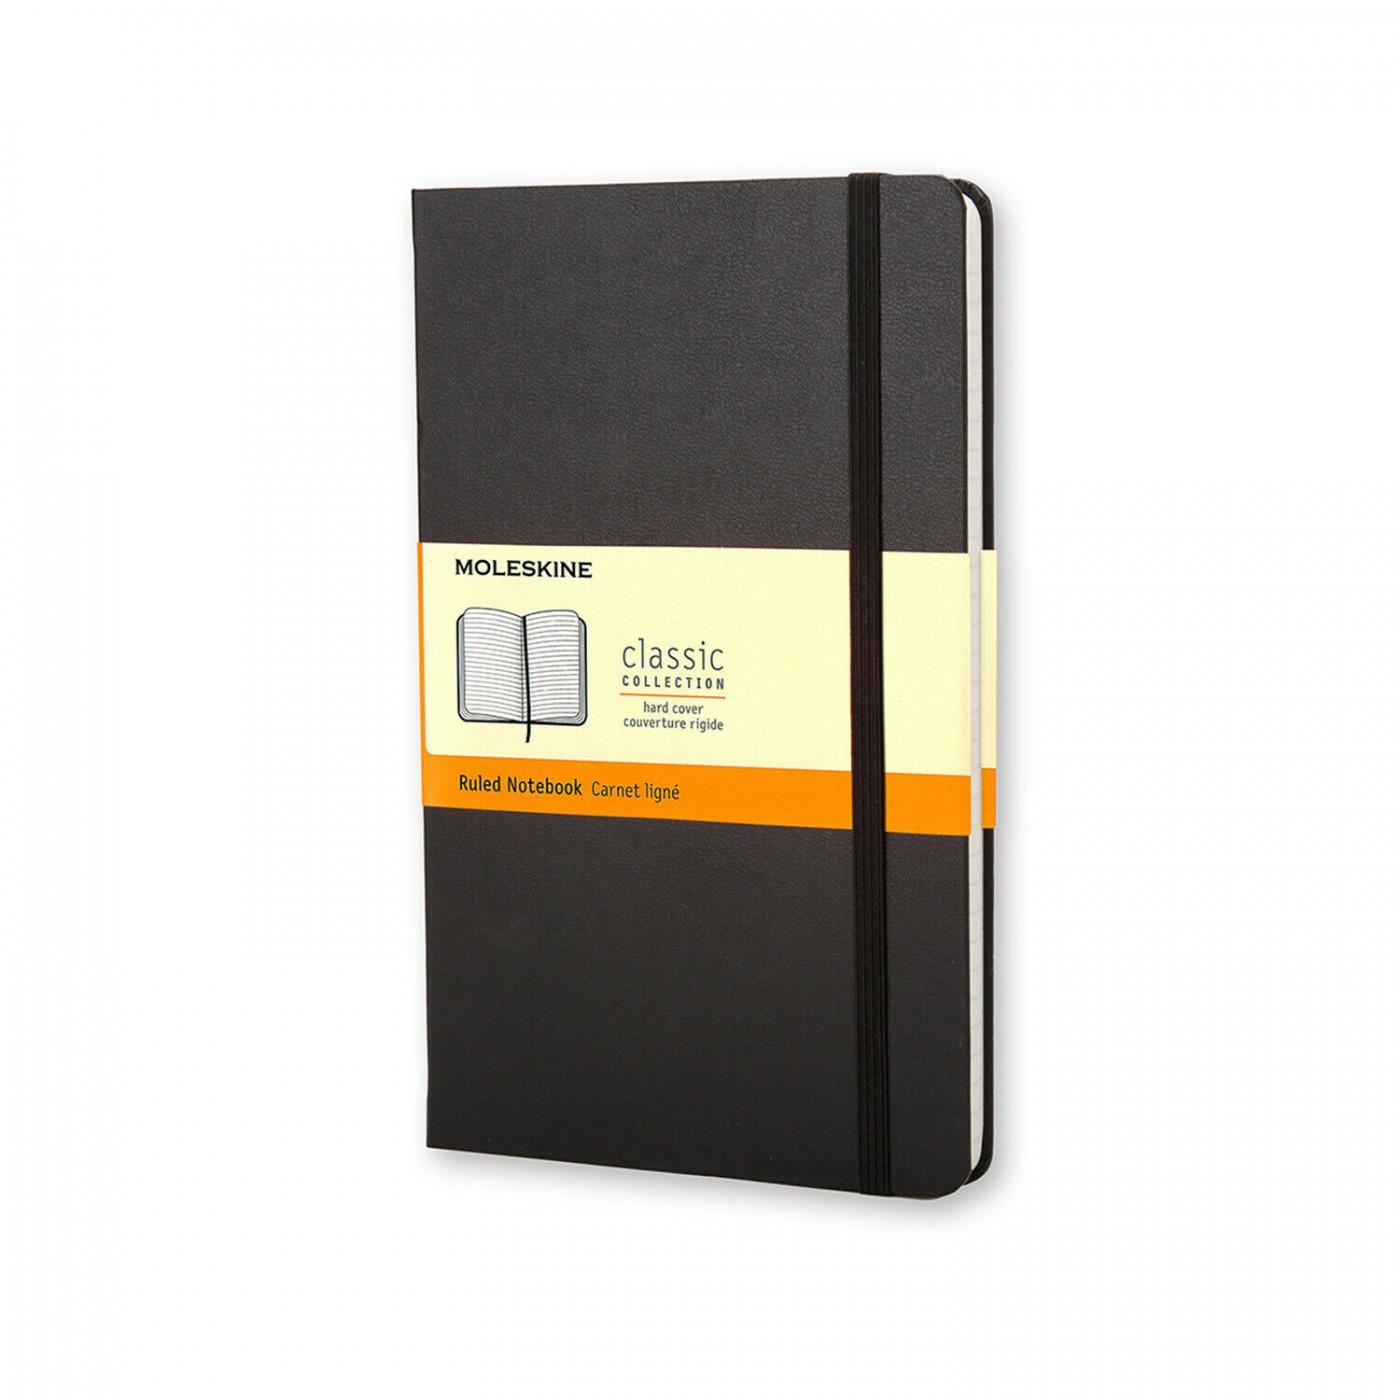 MOLESKINE taccuino Classic, pocket, copertina rigida nero